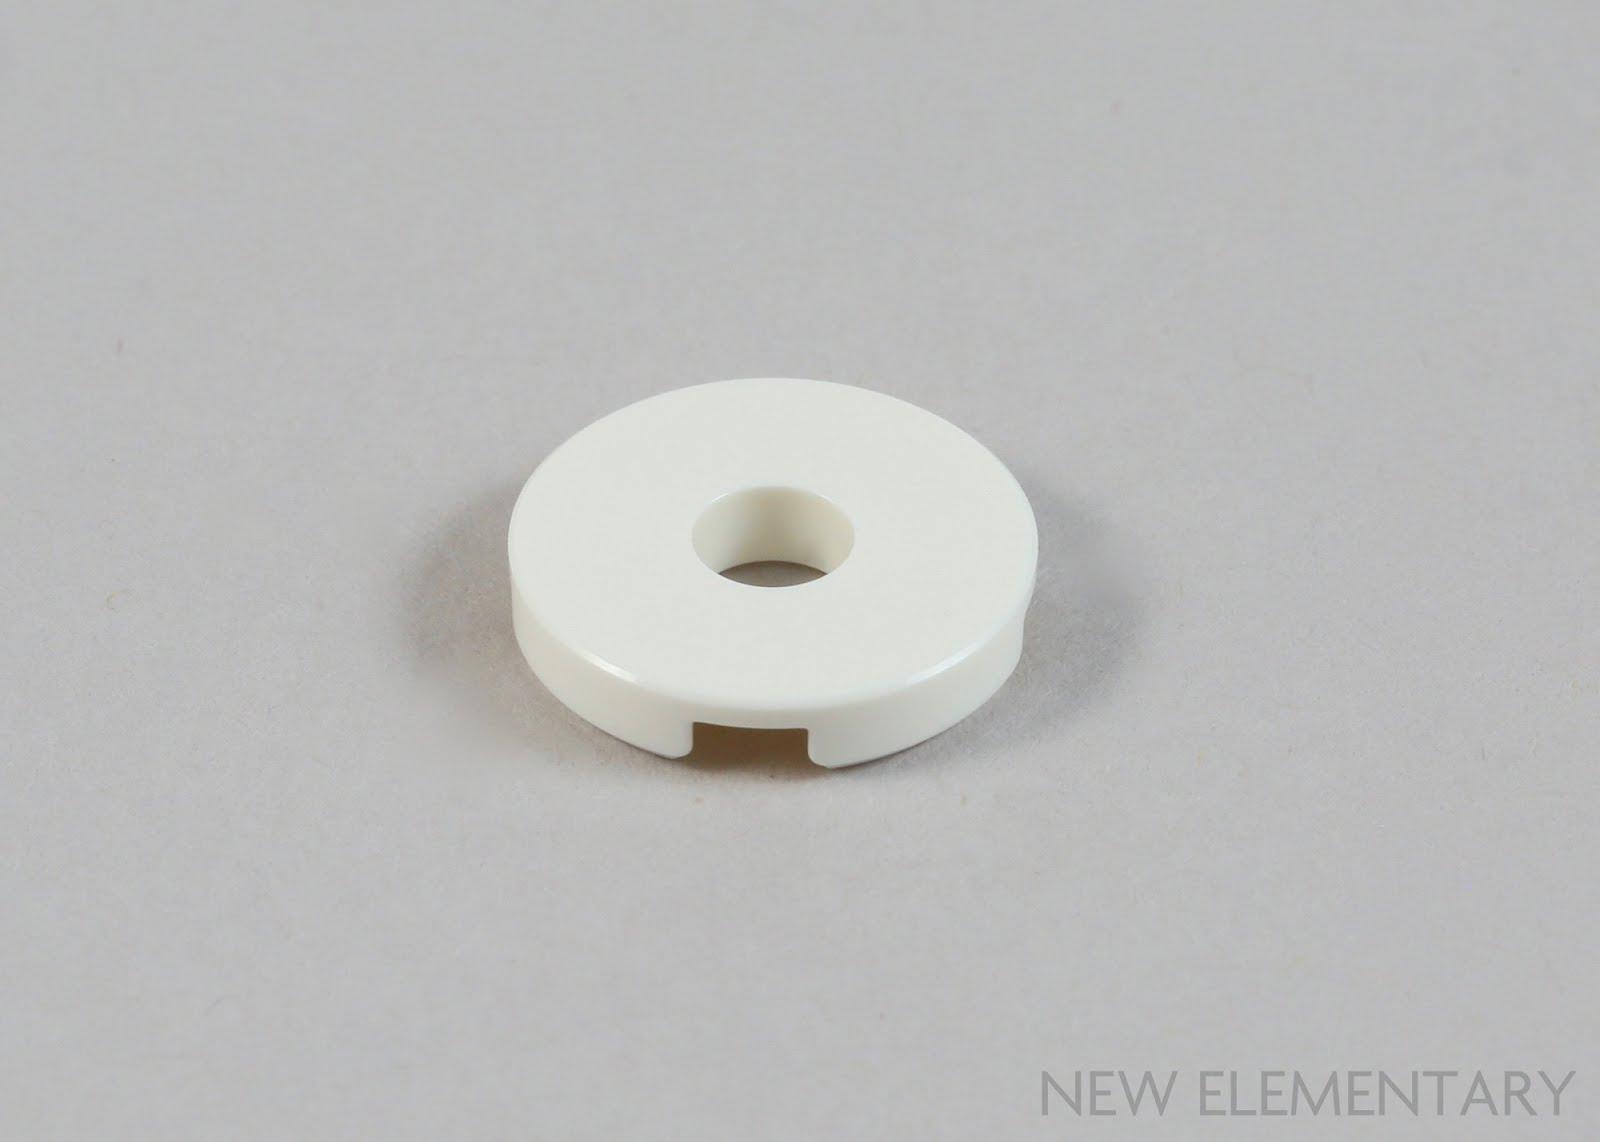 LEGO 15535 NEW 2x2 Dark Bluish Grey Flat Round Plates With Hole 4 Pieces